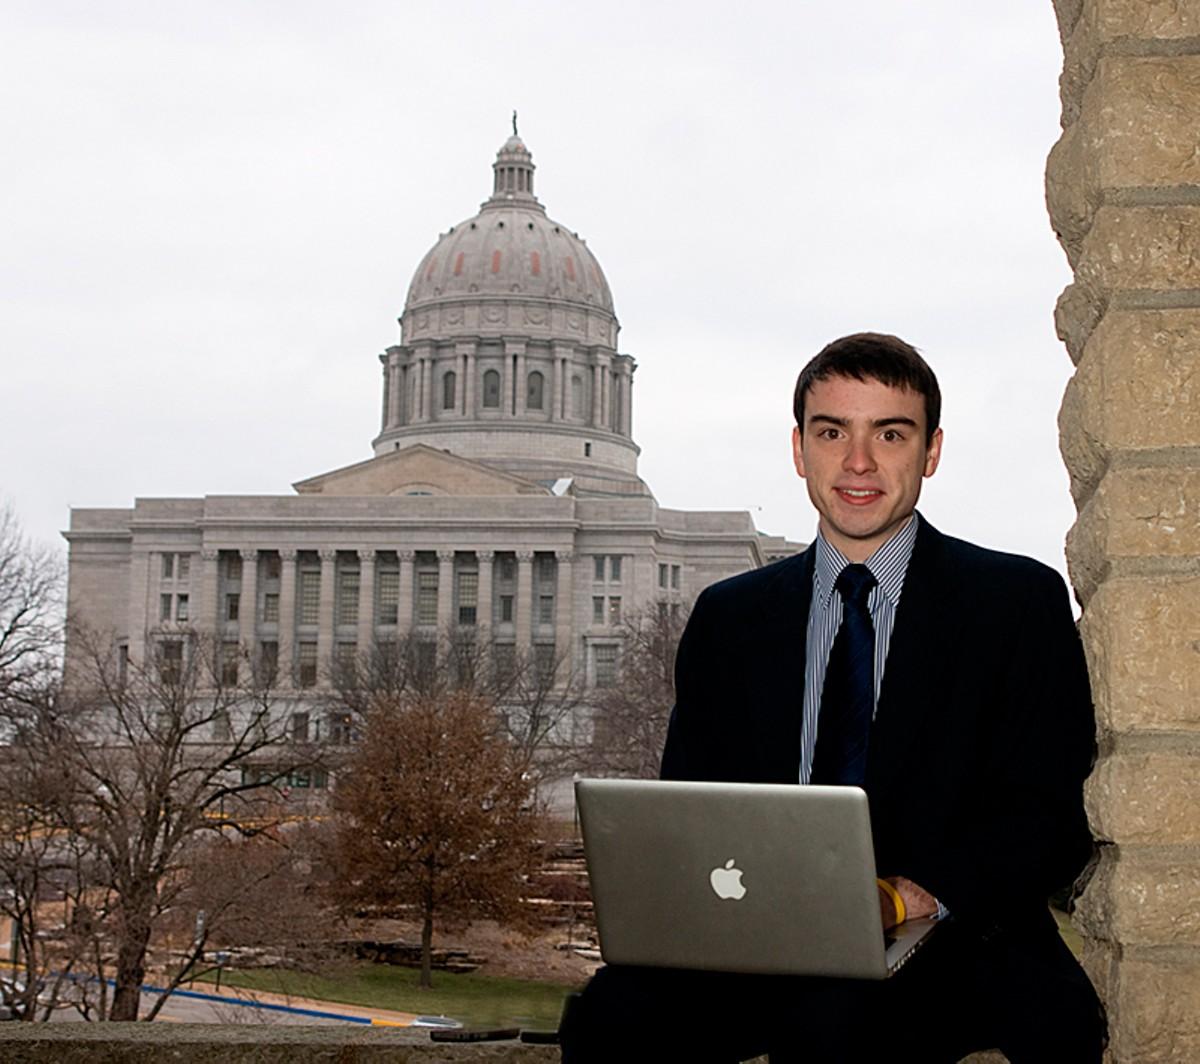 PoliticMO.com's Eli Yokley.